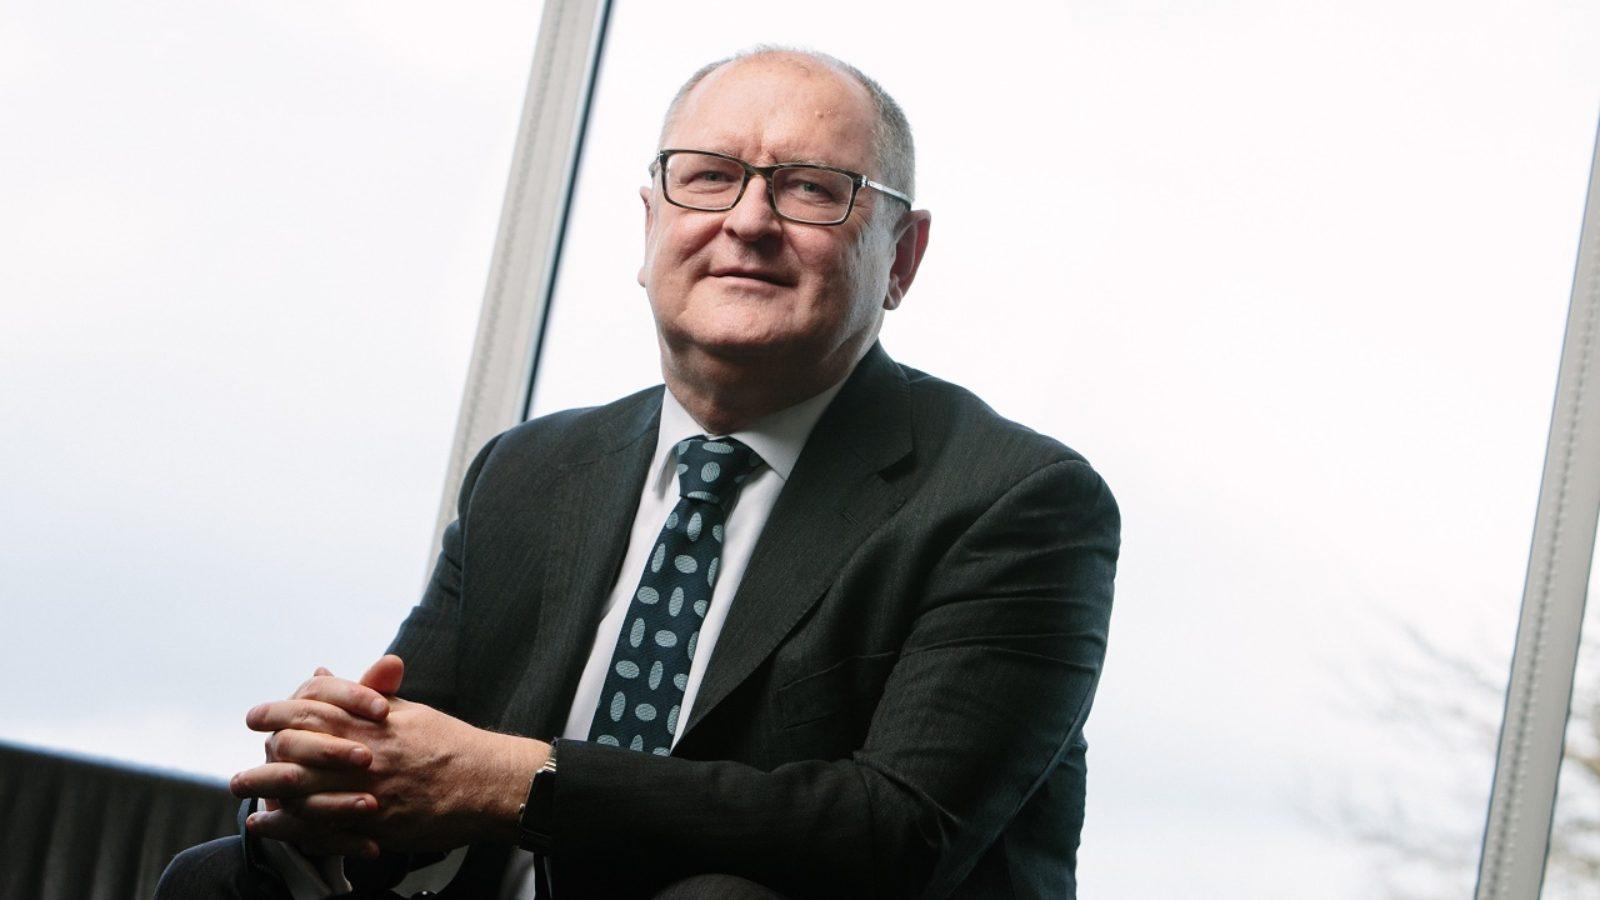 John McDonald, chief executive officer, OPITO